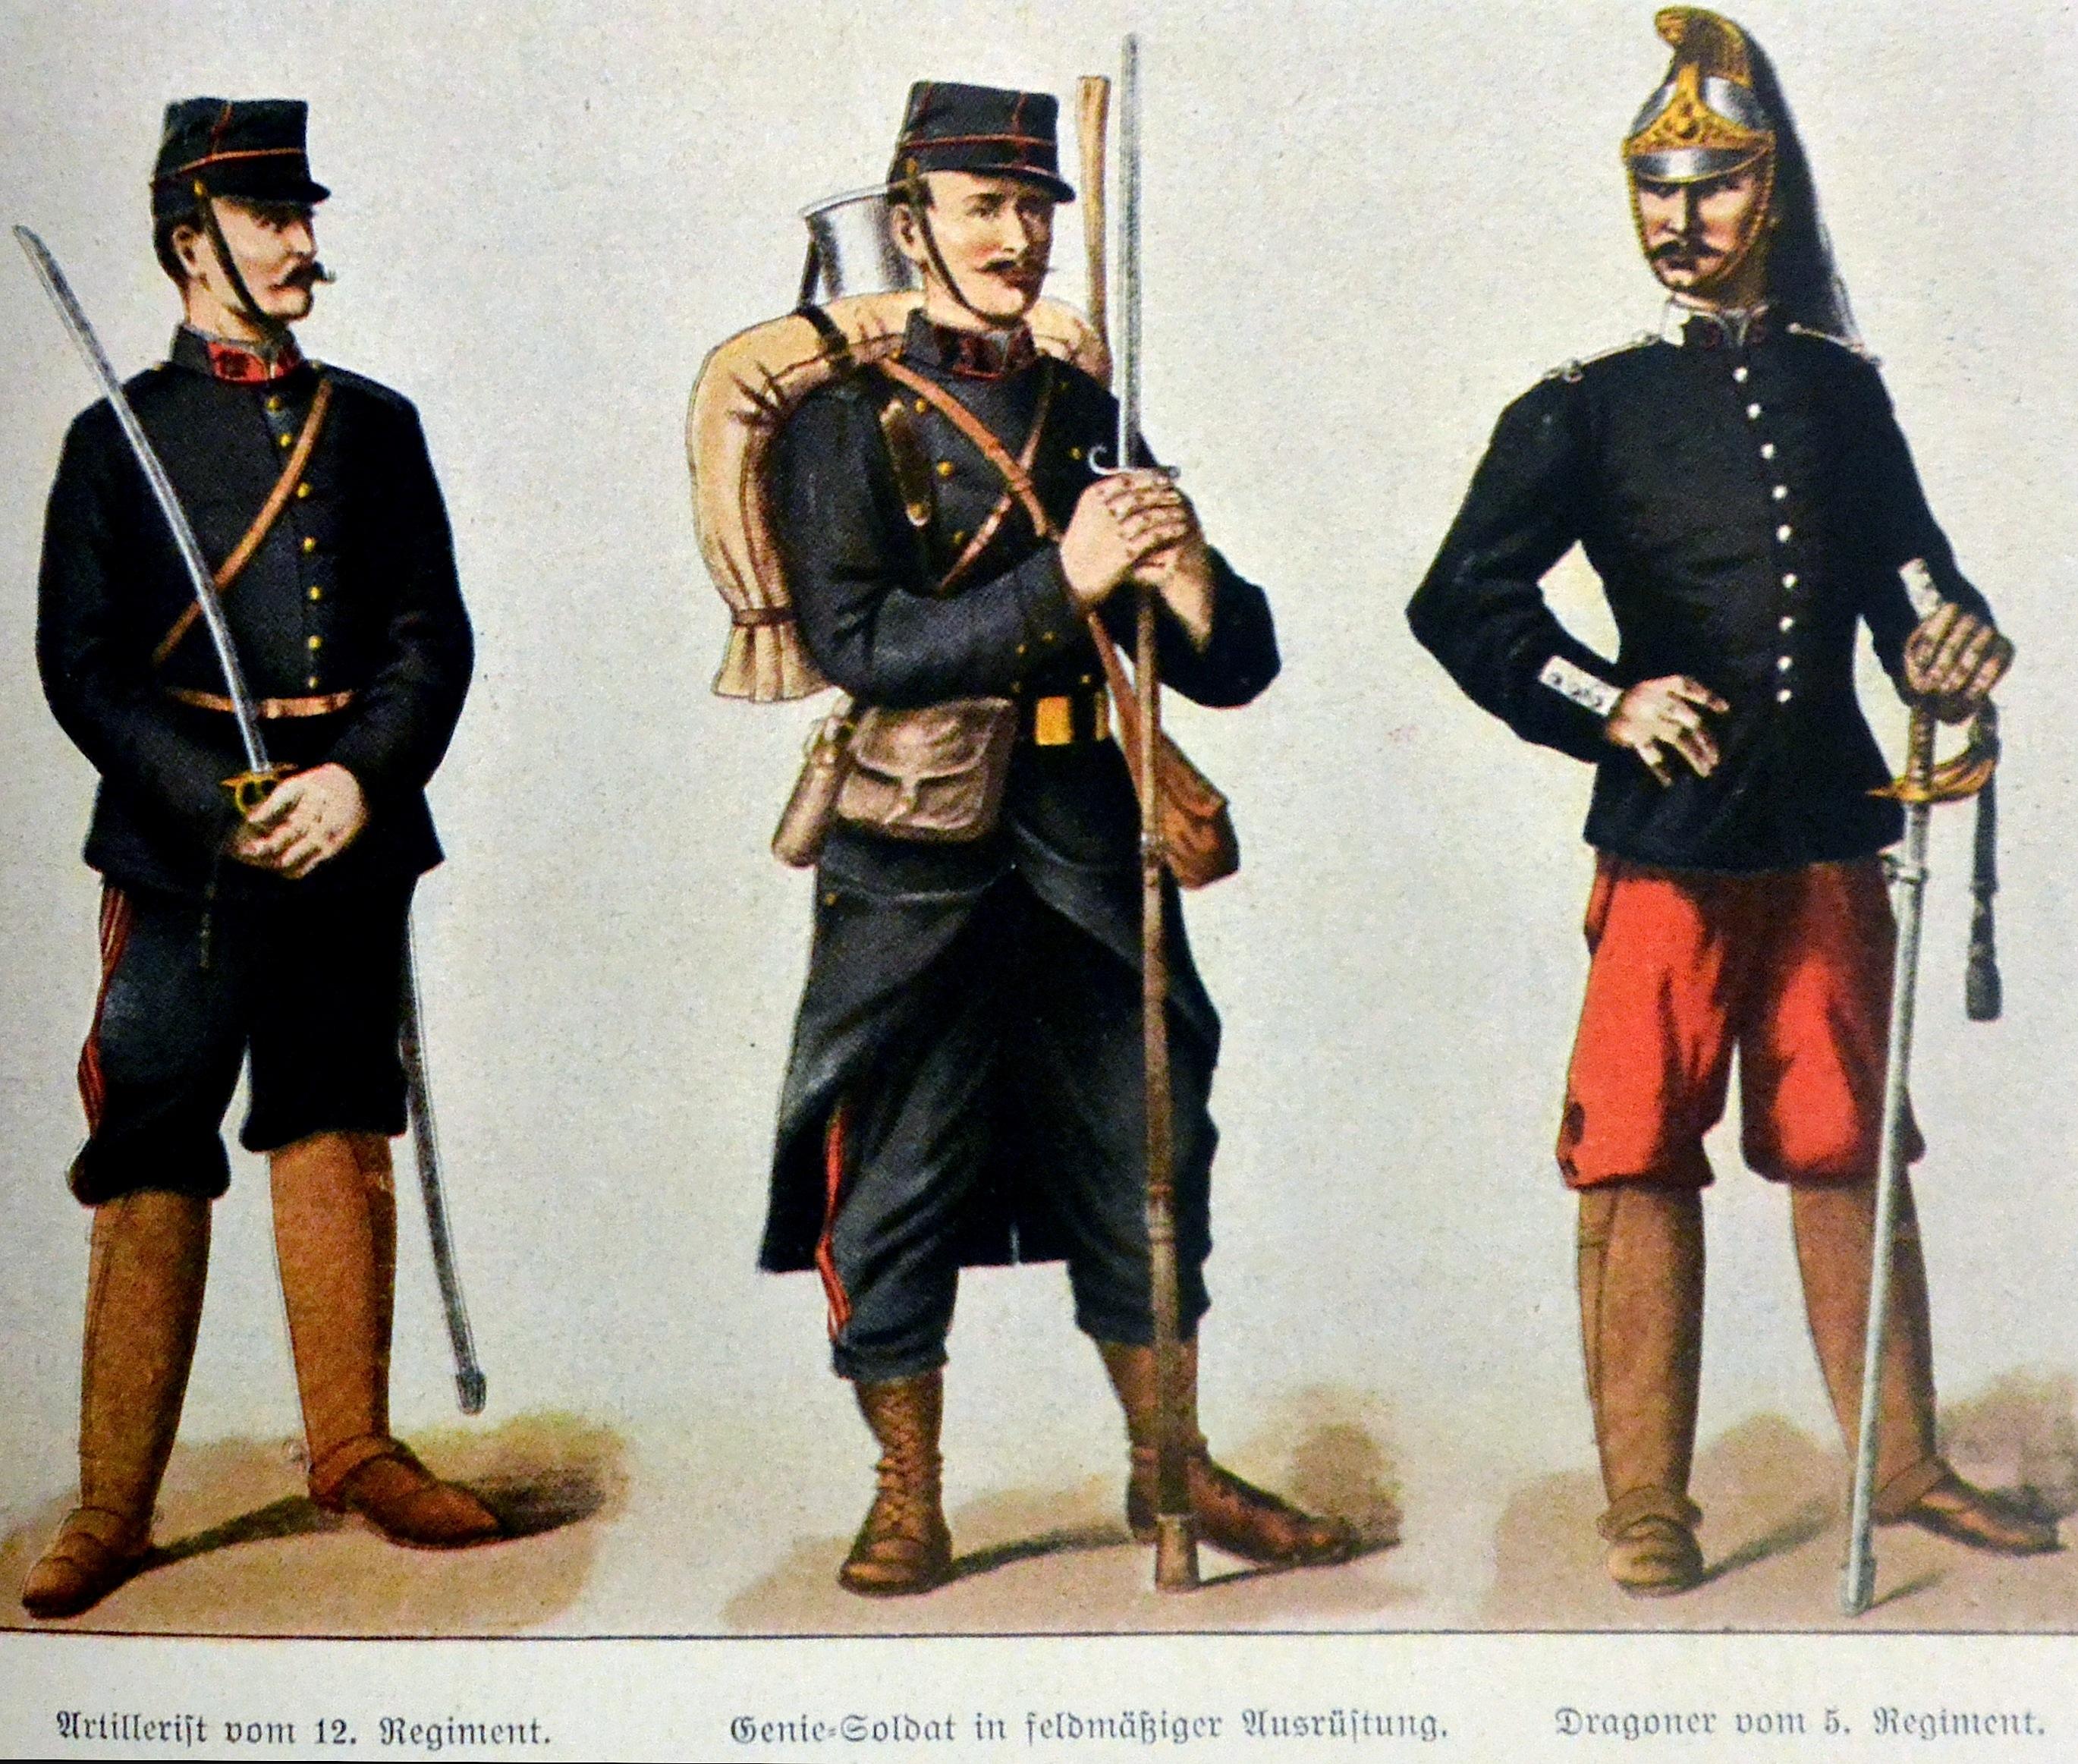 the French uniforms (artillery, engineering, dragons) - le uniformi francesi (artiglieria, genio, dragoni)